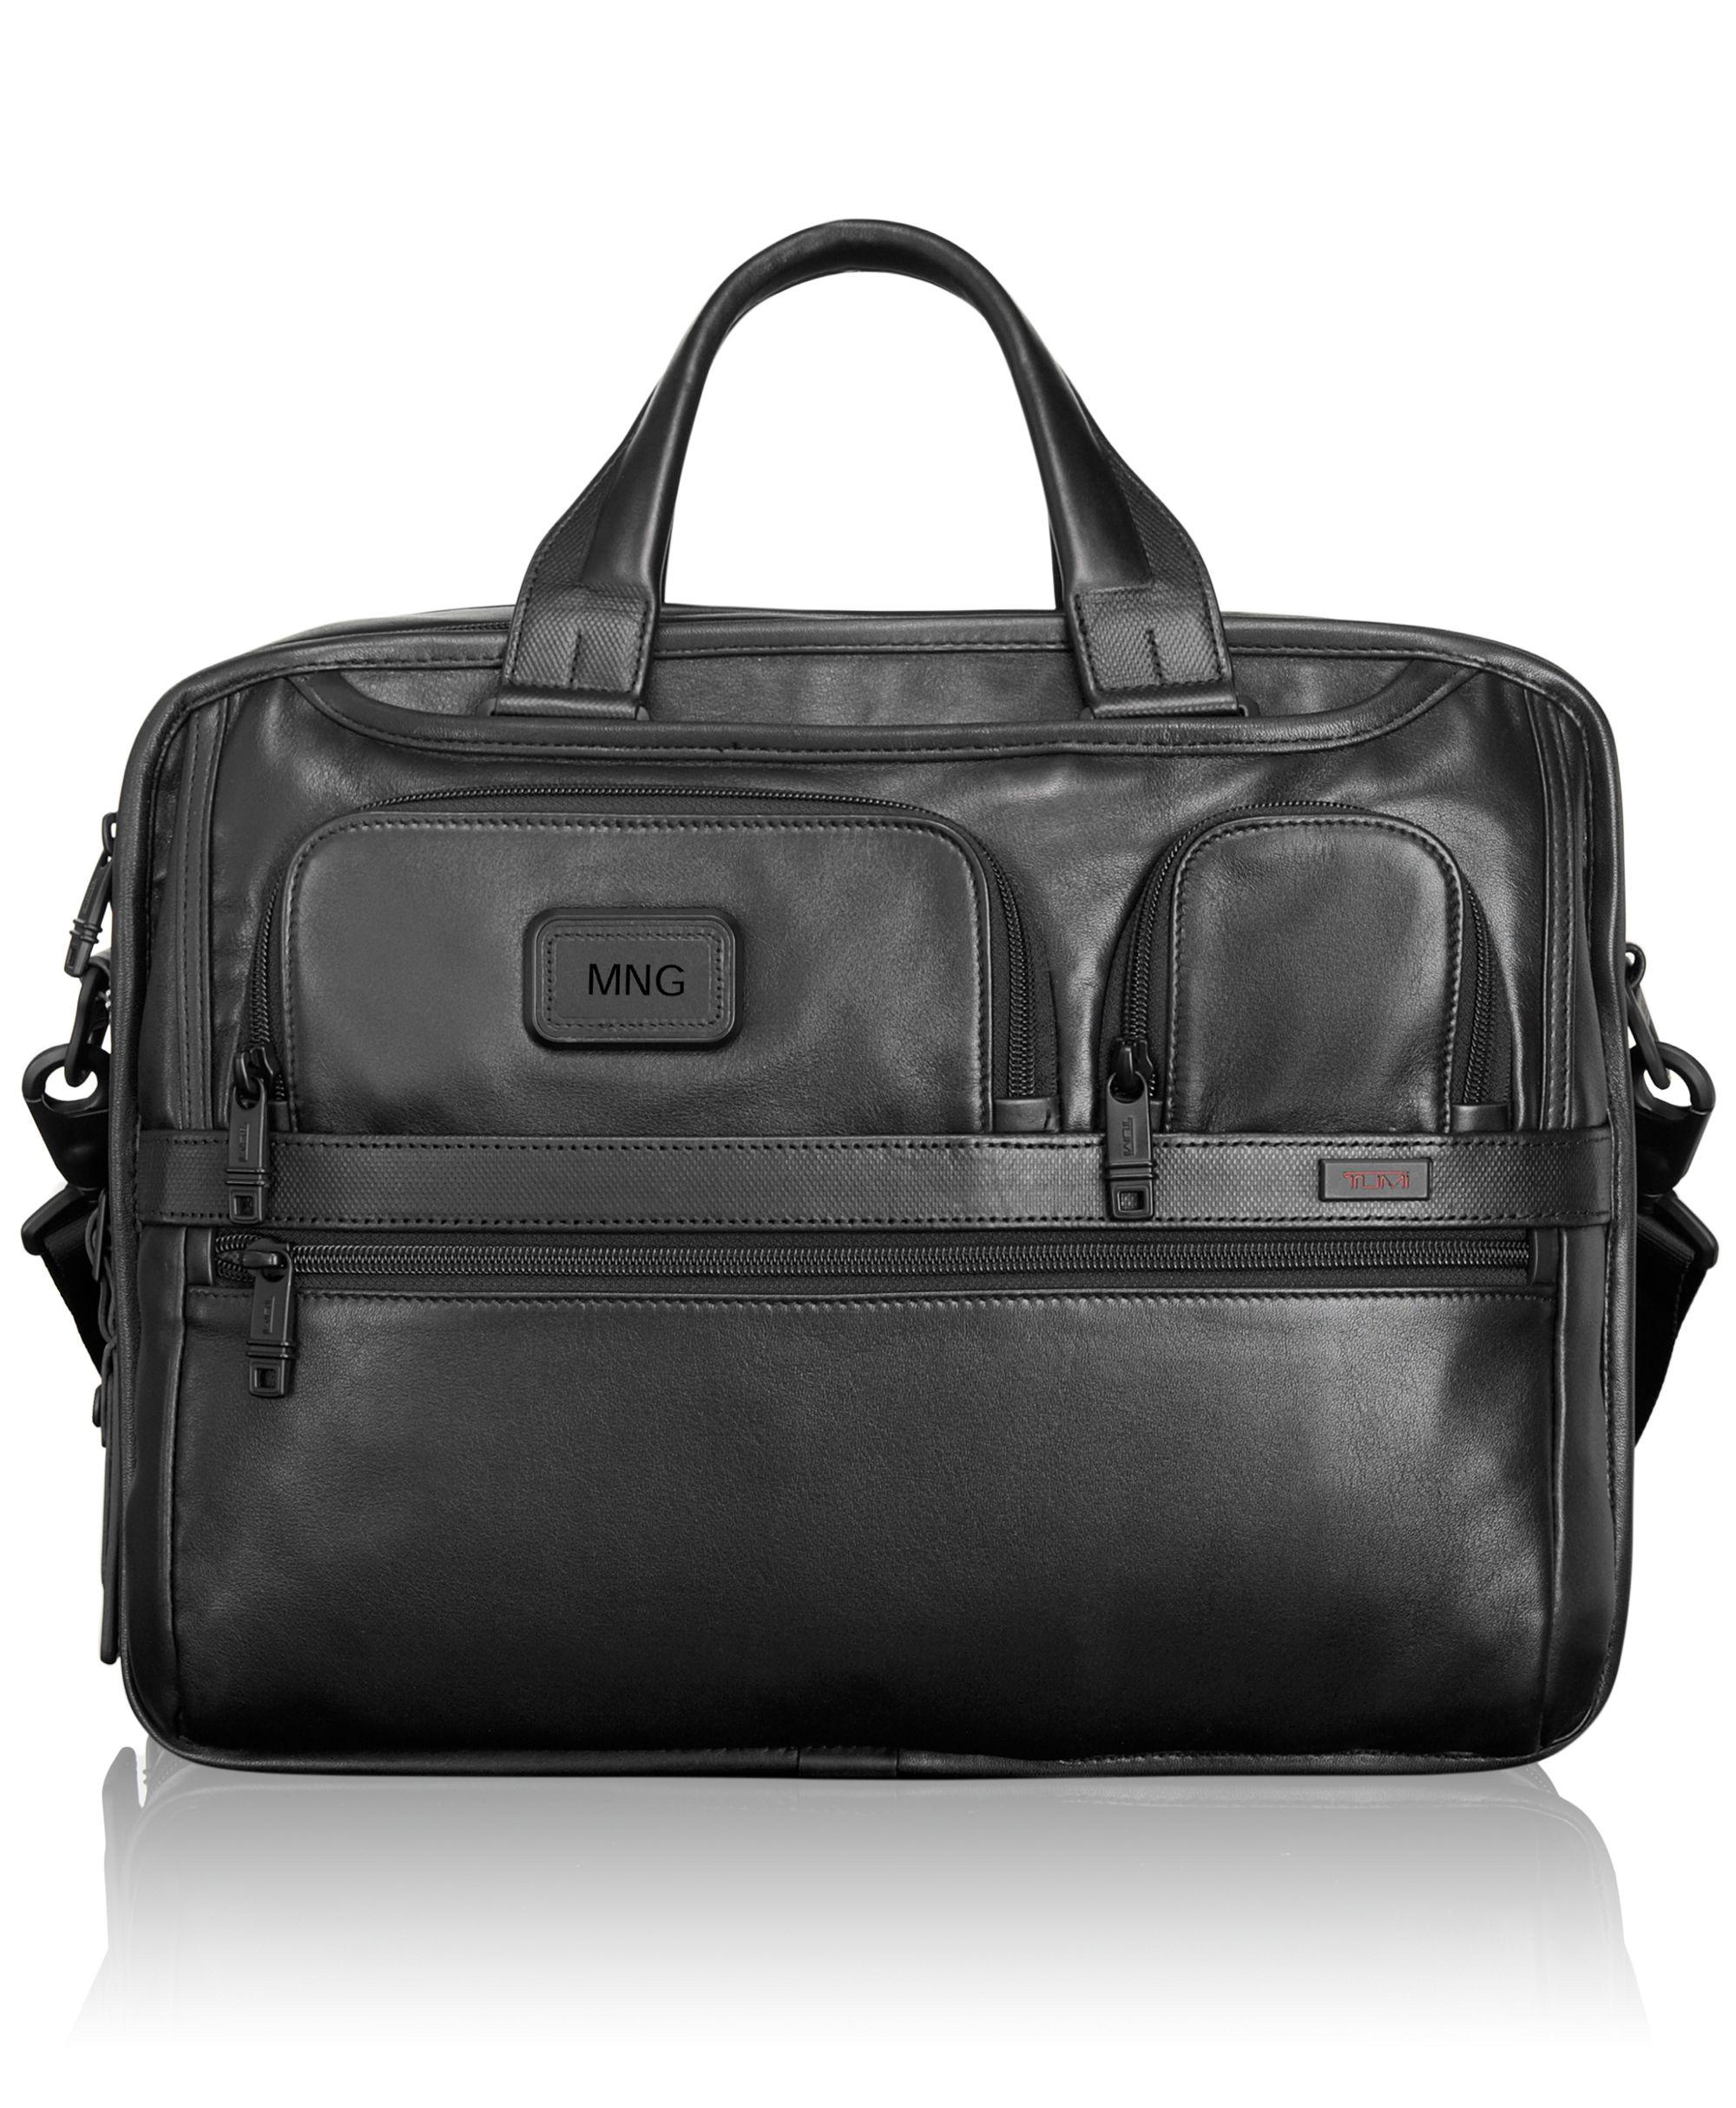 Tumi Laptop Shoulder Bag 48